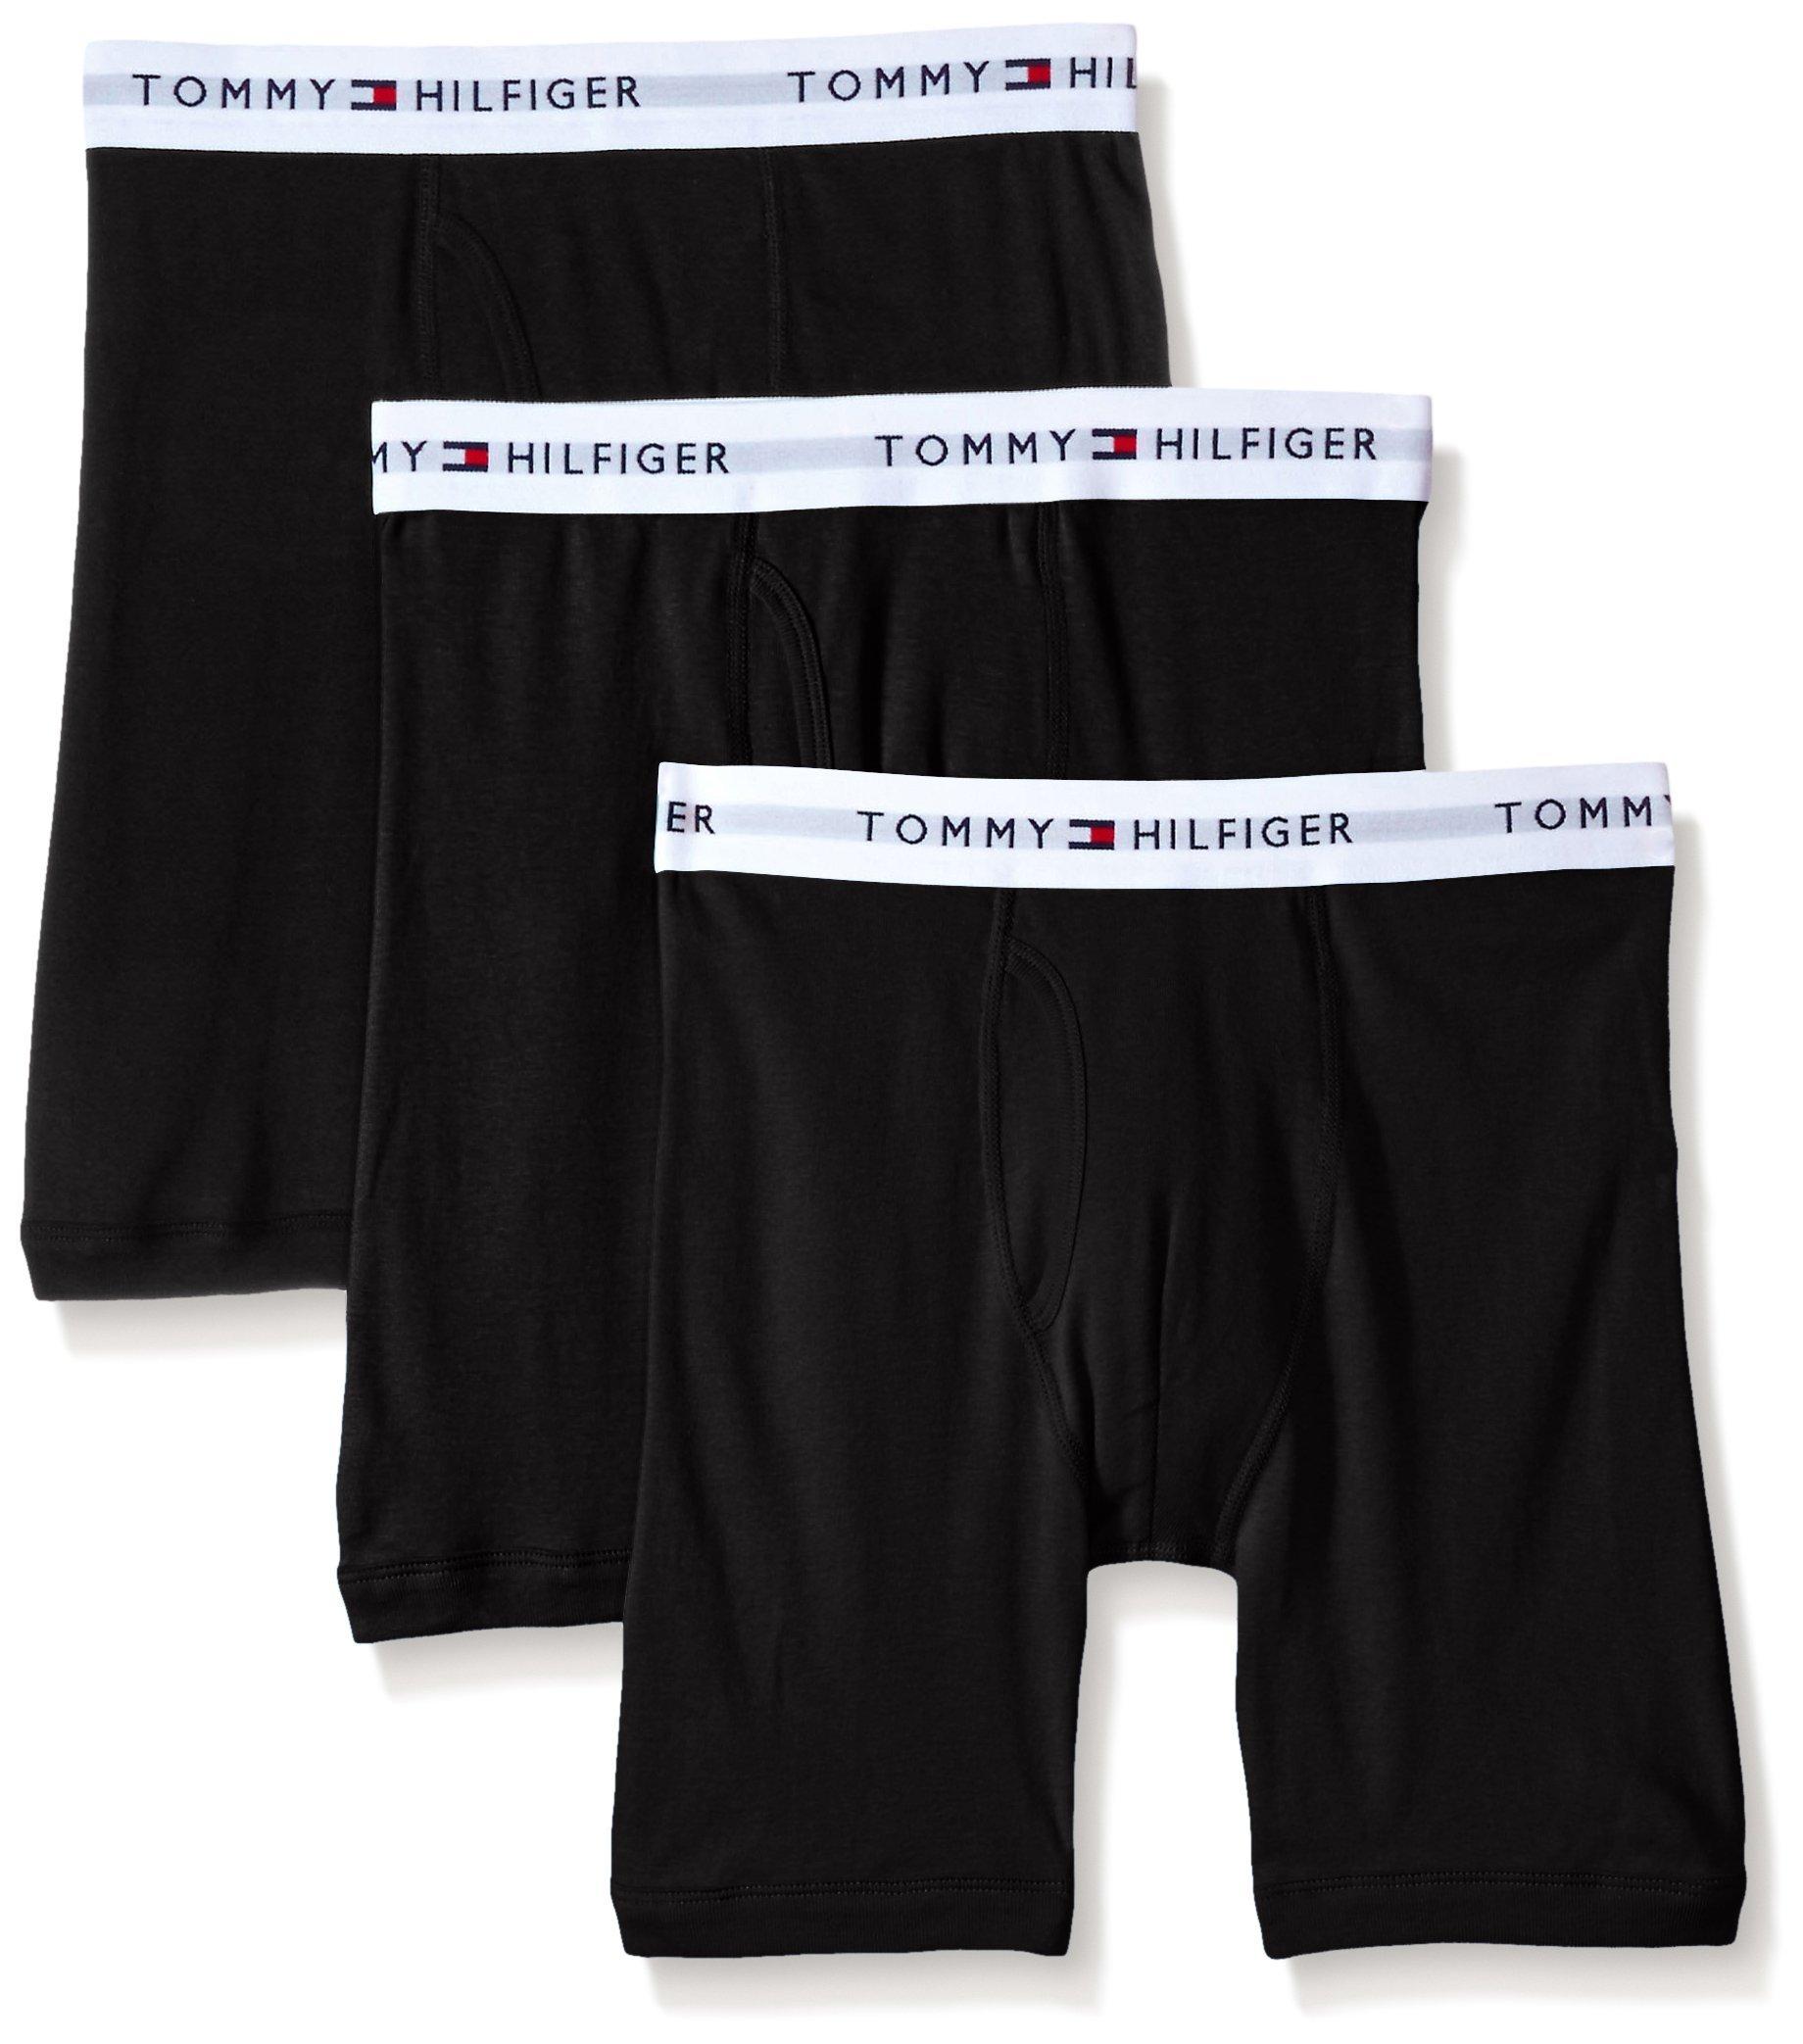 Tommy Hilfiger Men's 3-Pack Cotton Boxer Brief,Black,Large(36-38)